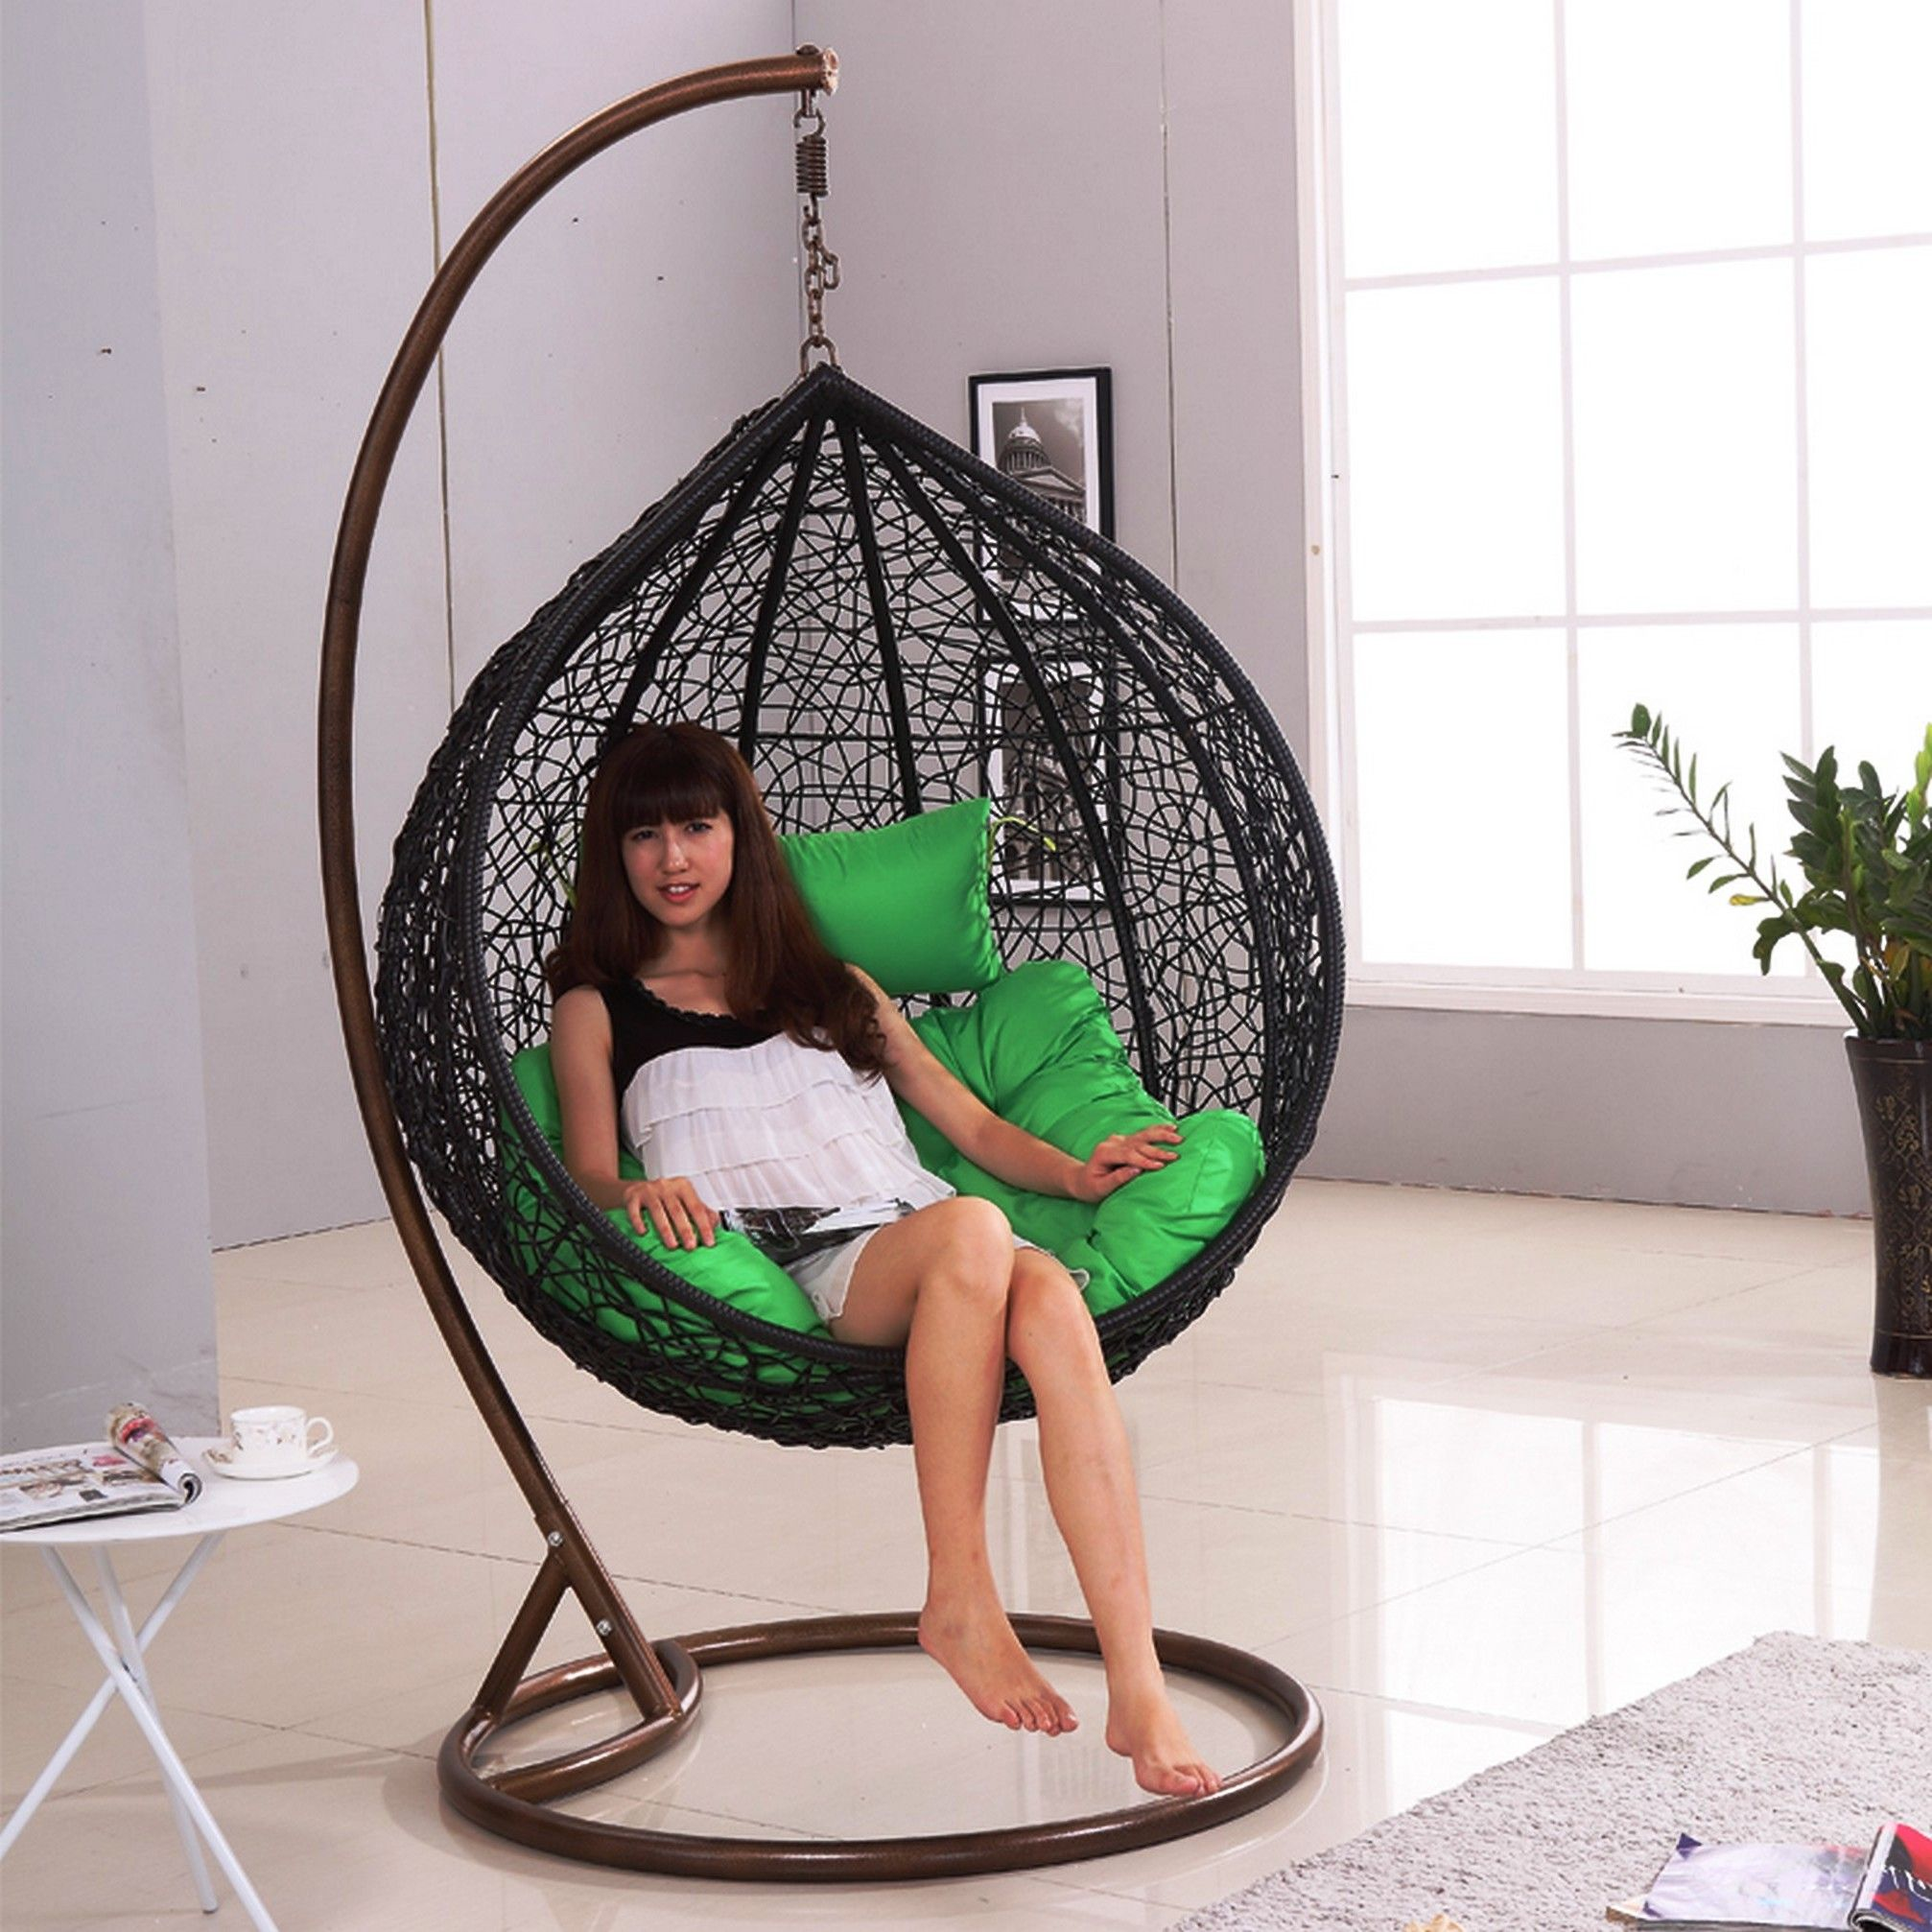 Image result for hanging wicker chair Indoor hammock bed